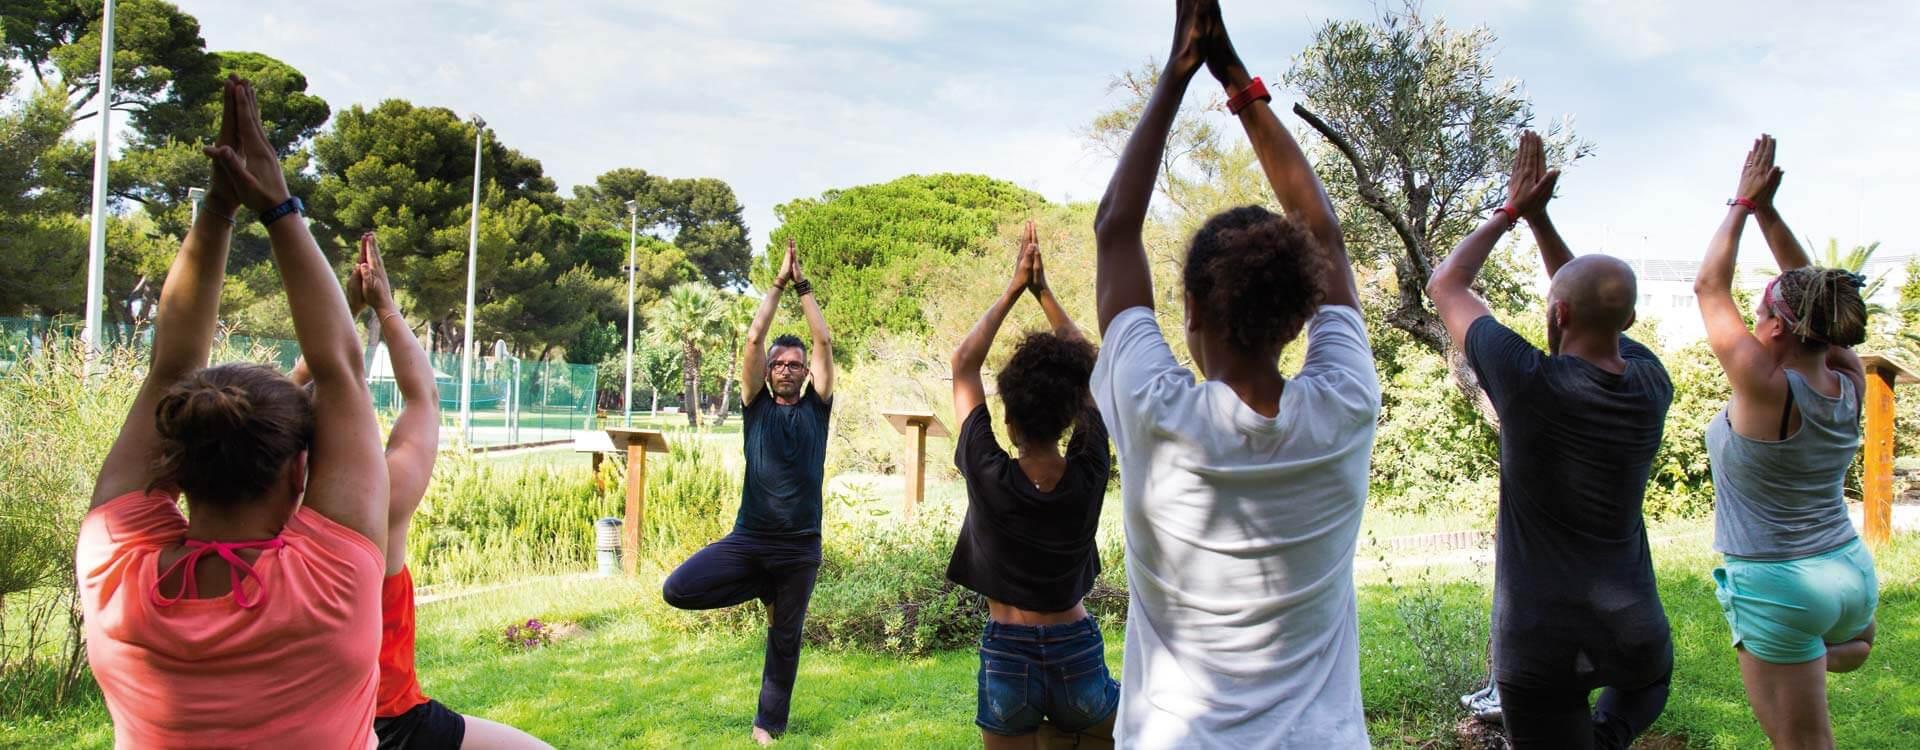 cours yoga plein sud